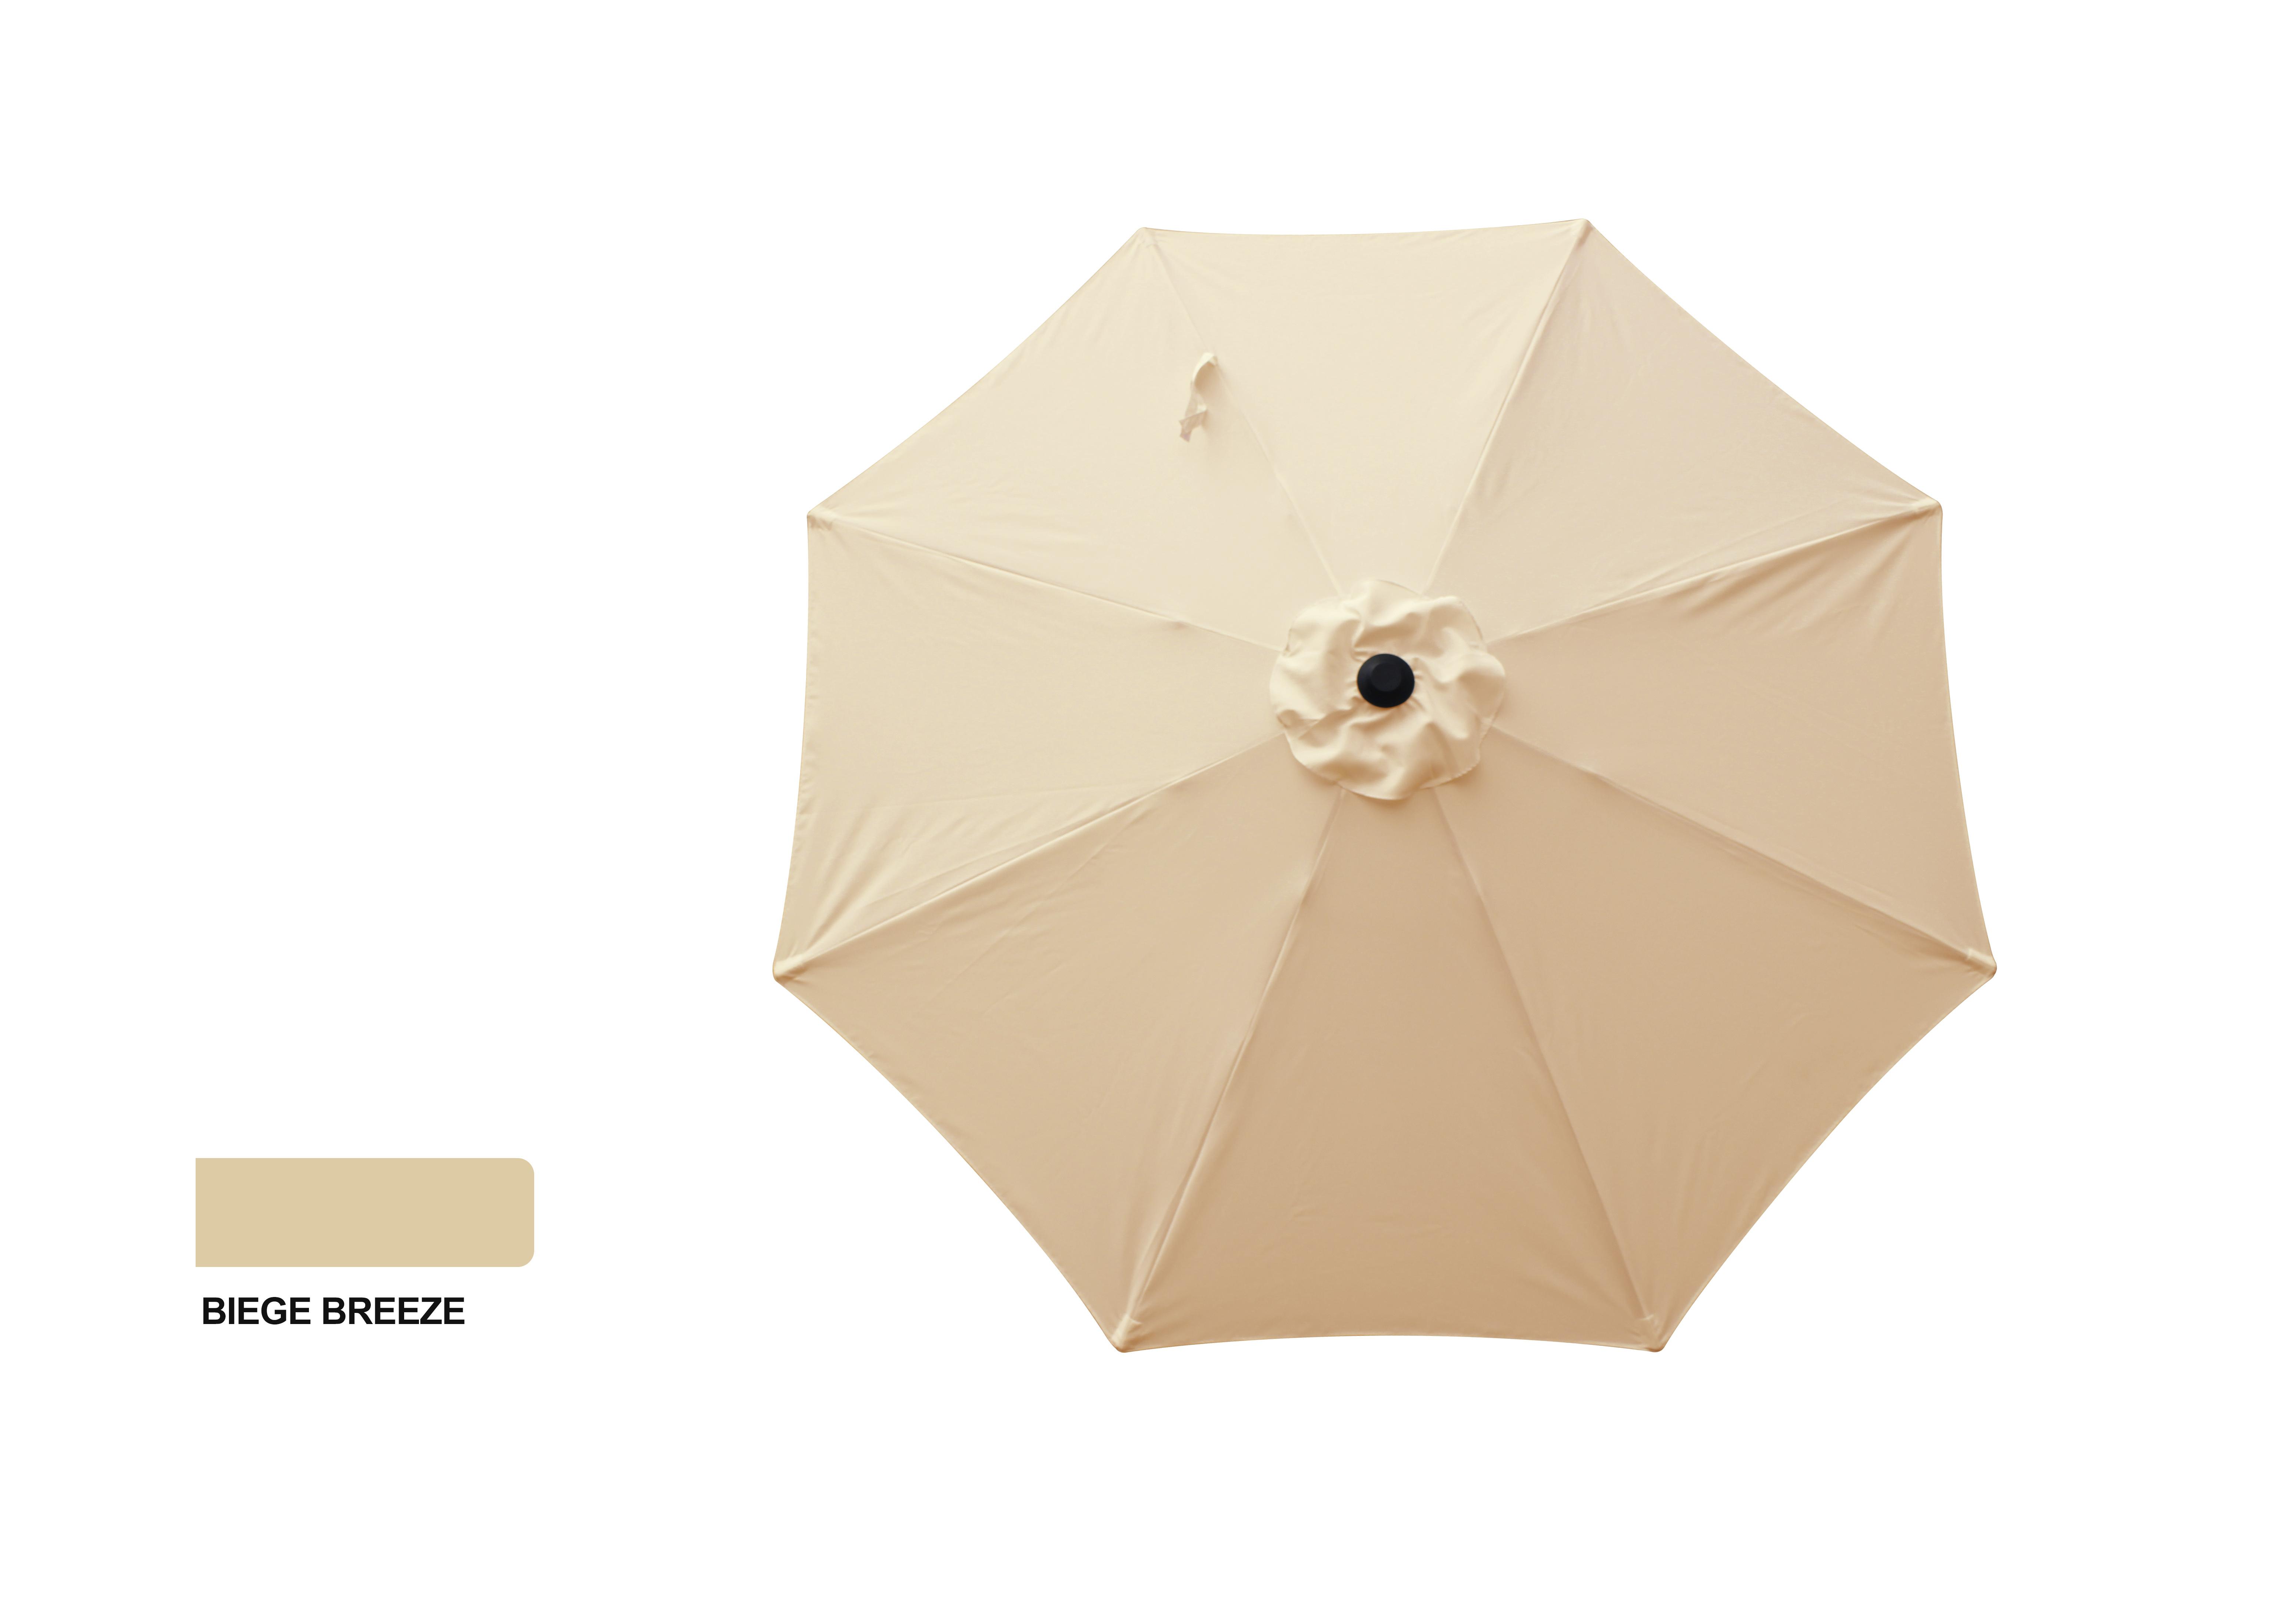 9' Aluminum Market Umbrella - Beige Breeze